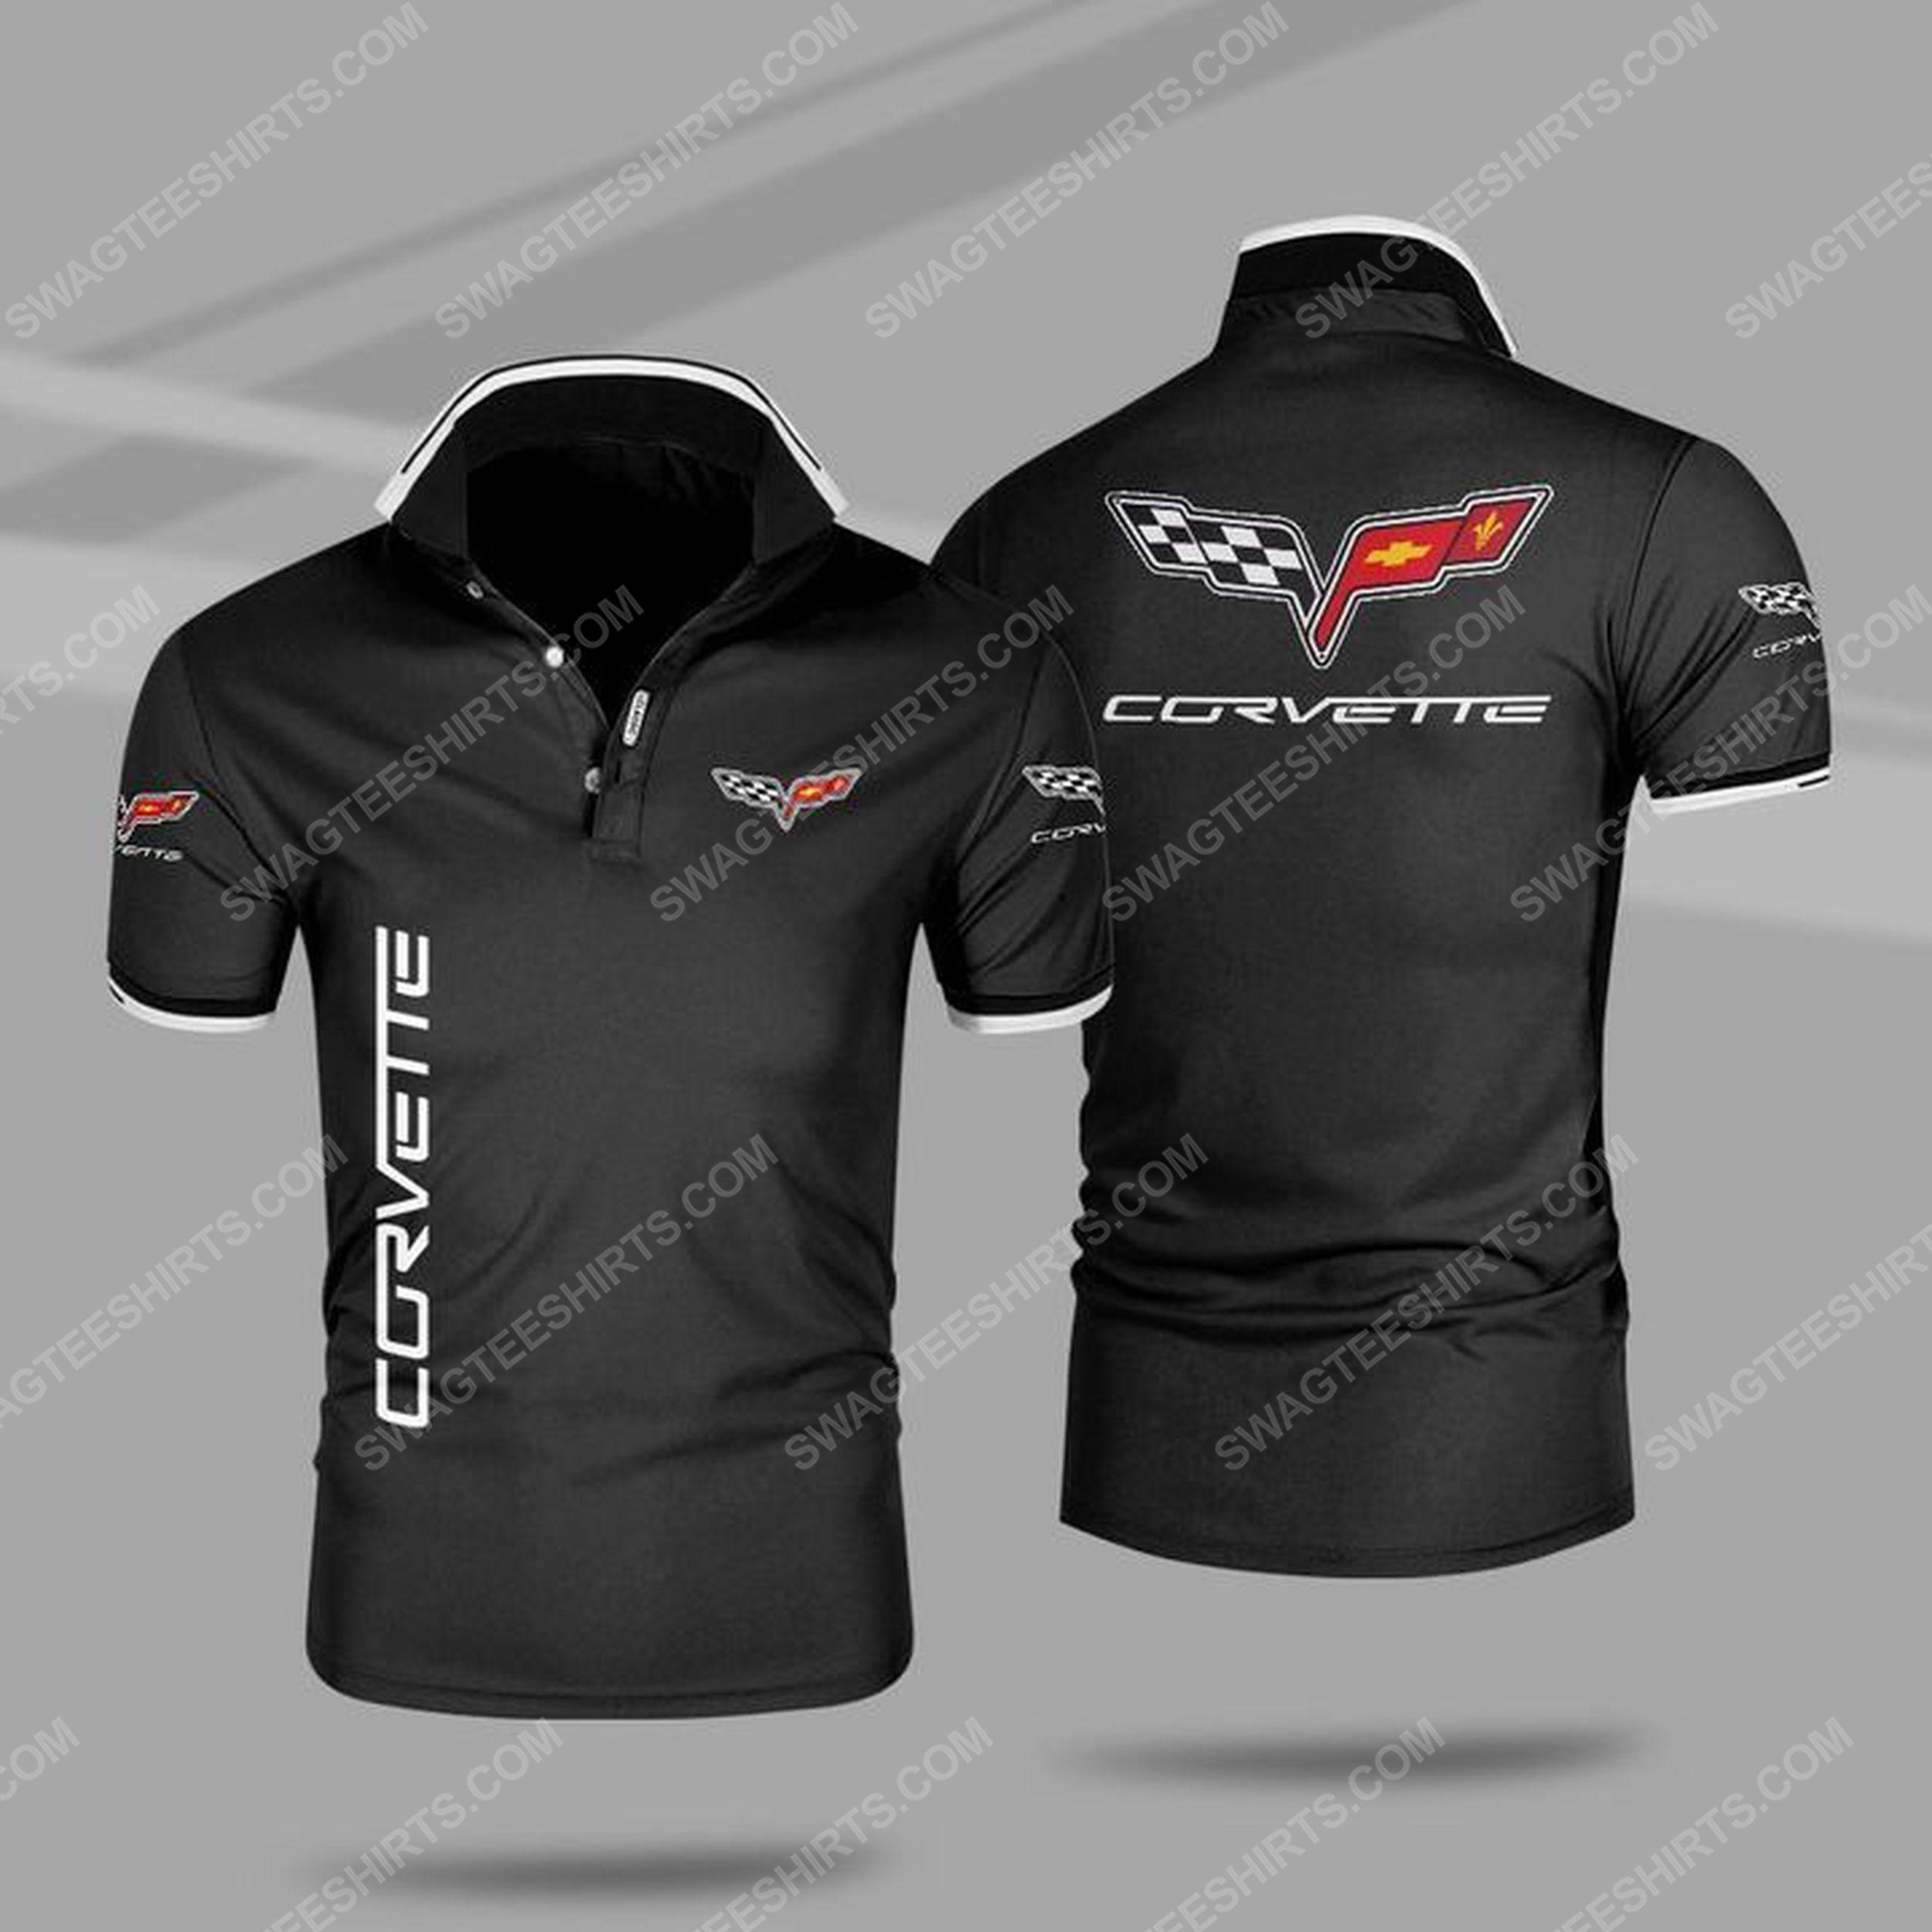 The chevrolet corvette symbol all over print polo shirt - black 1